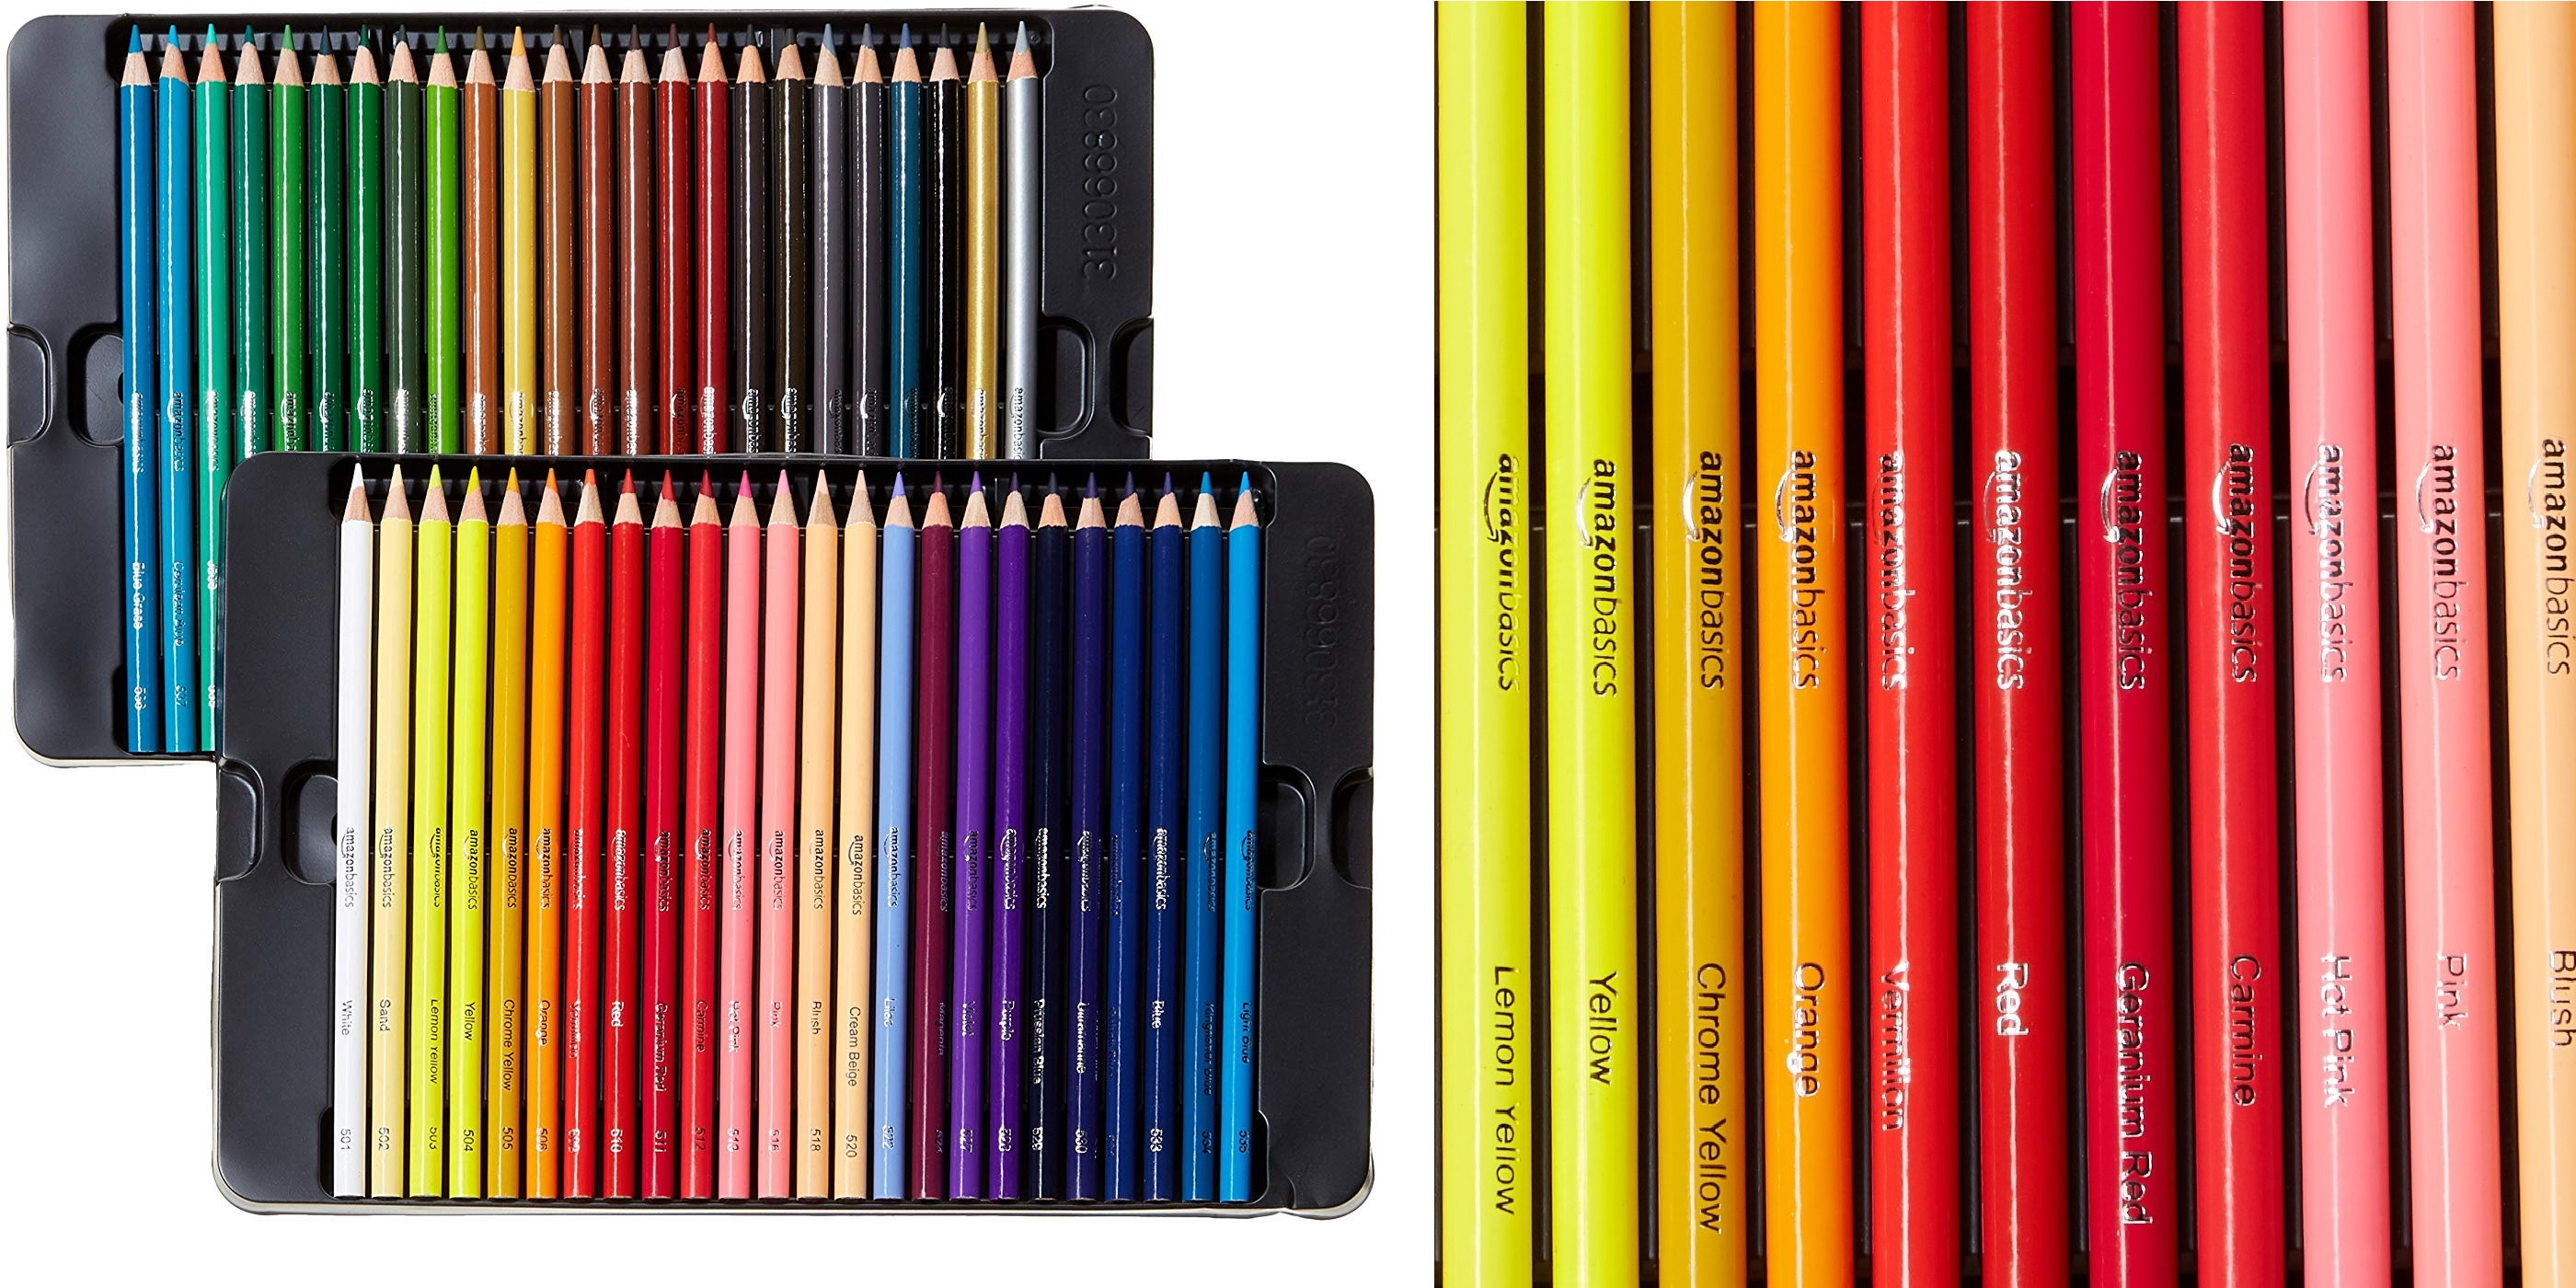 Basics Colored Pencils 48-Count Set